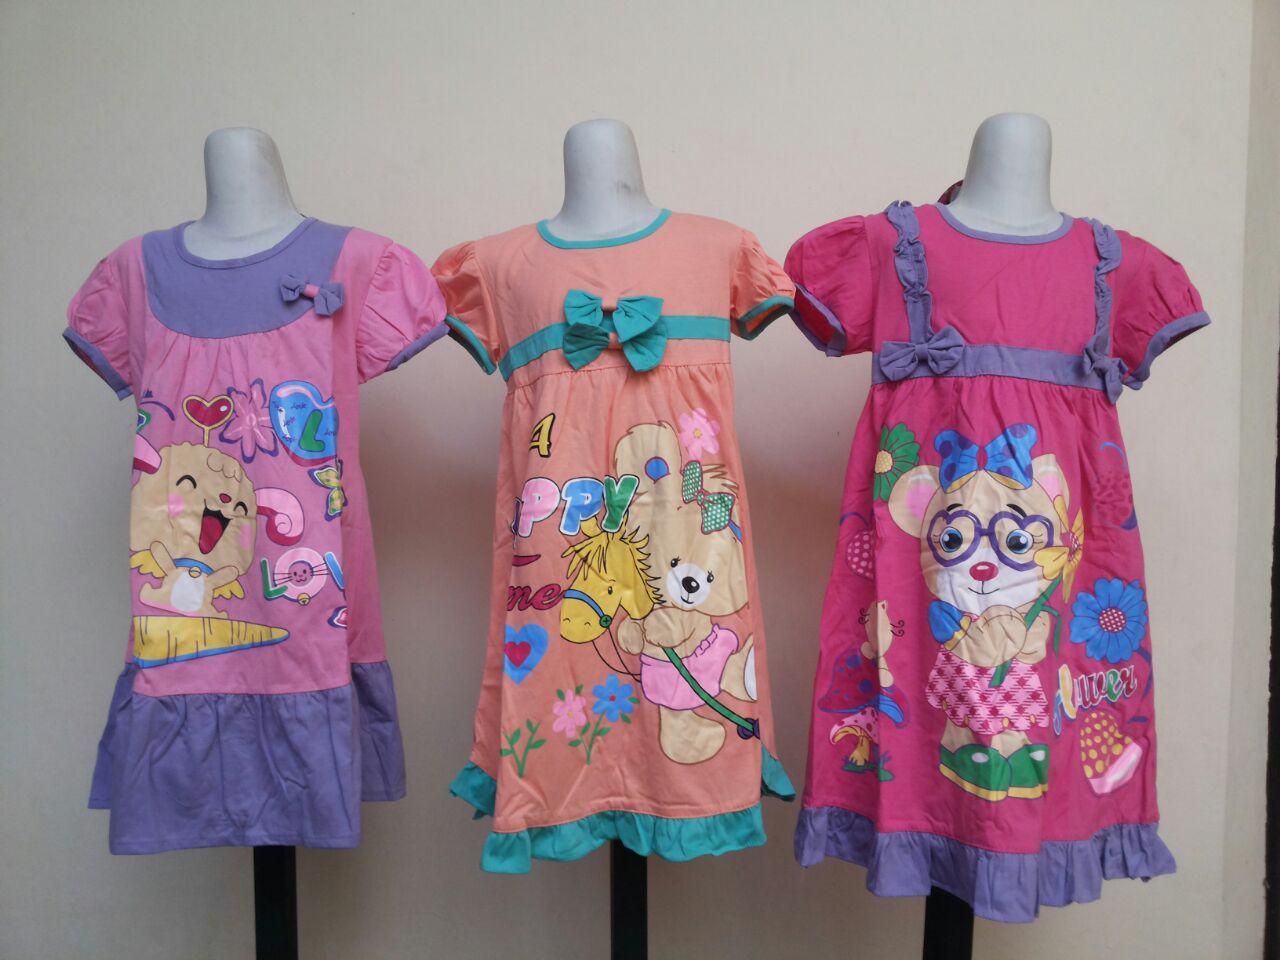 Pusat Grosir Cimahi Grosir Dress Vanessa Karakter Anak Perempuan Murah 27Ribu